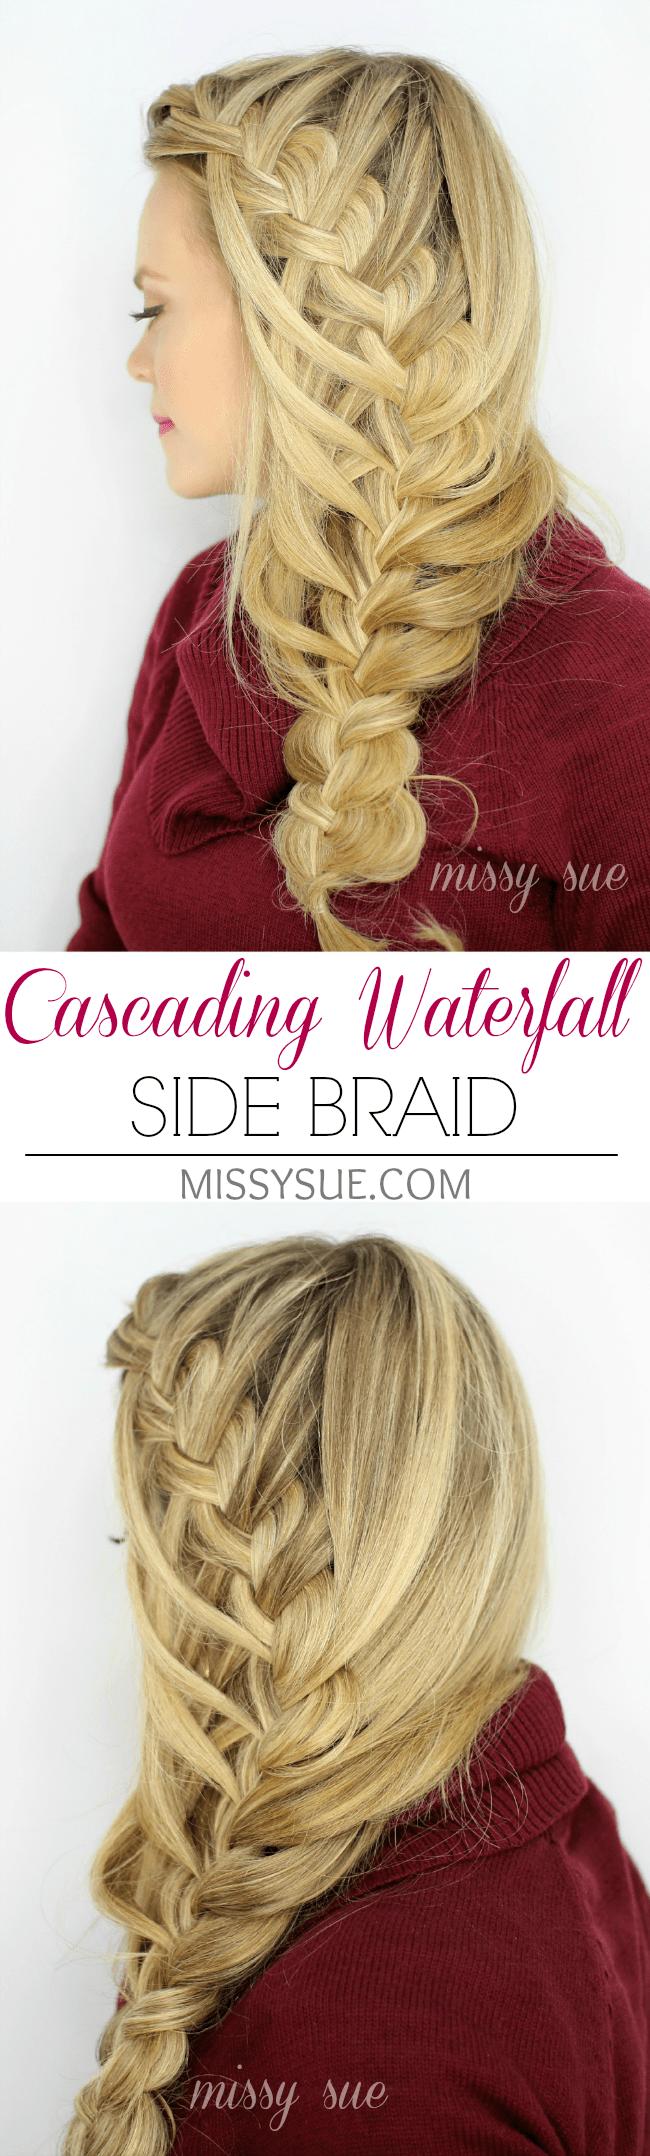 Cascading Waterfall Side Braid